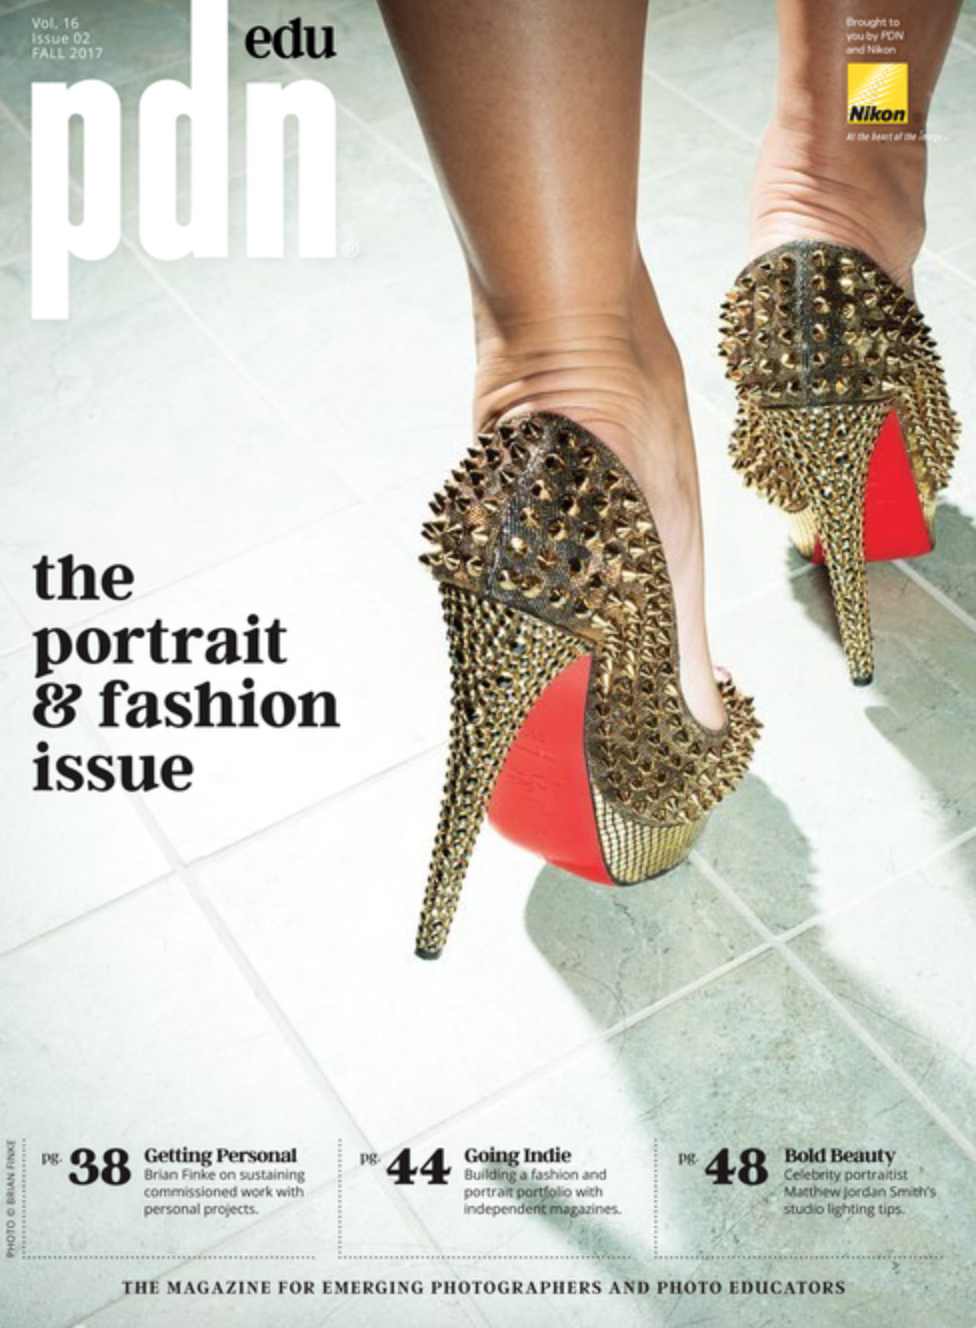 Lena_Mirisola_PDN_Magazine_4.jpg